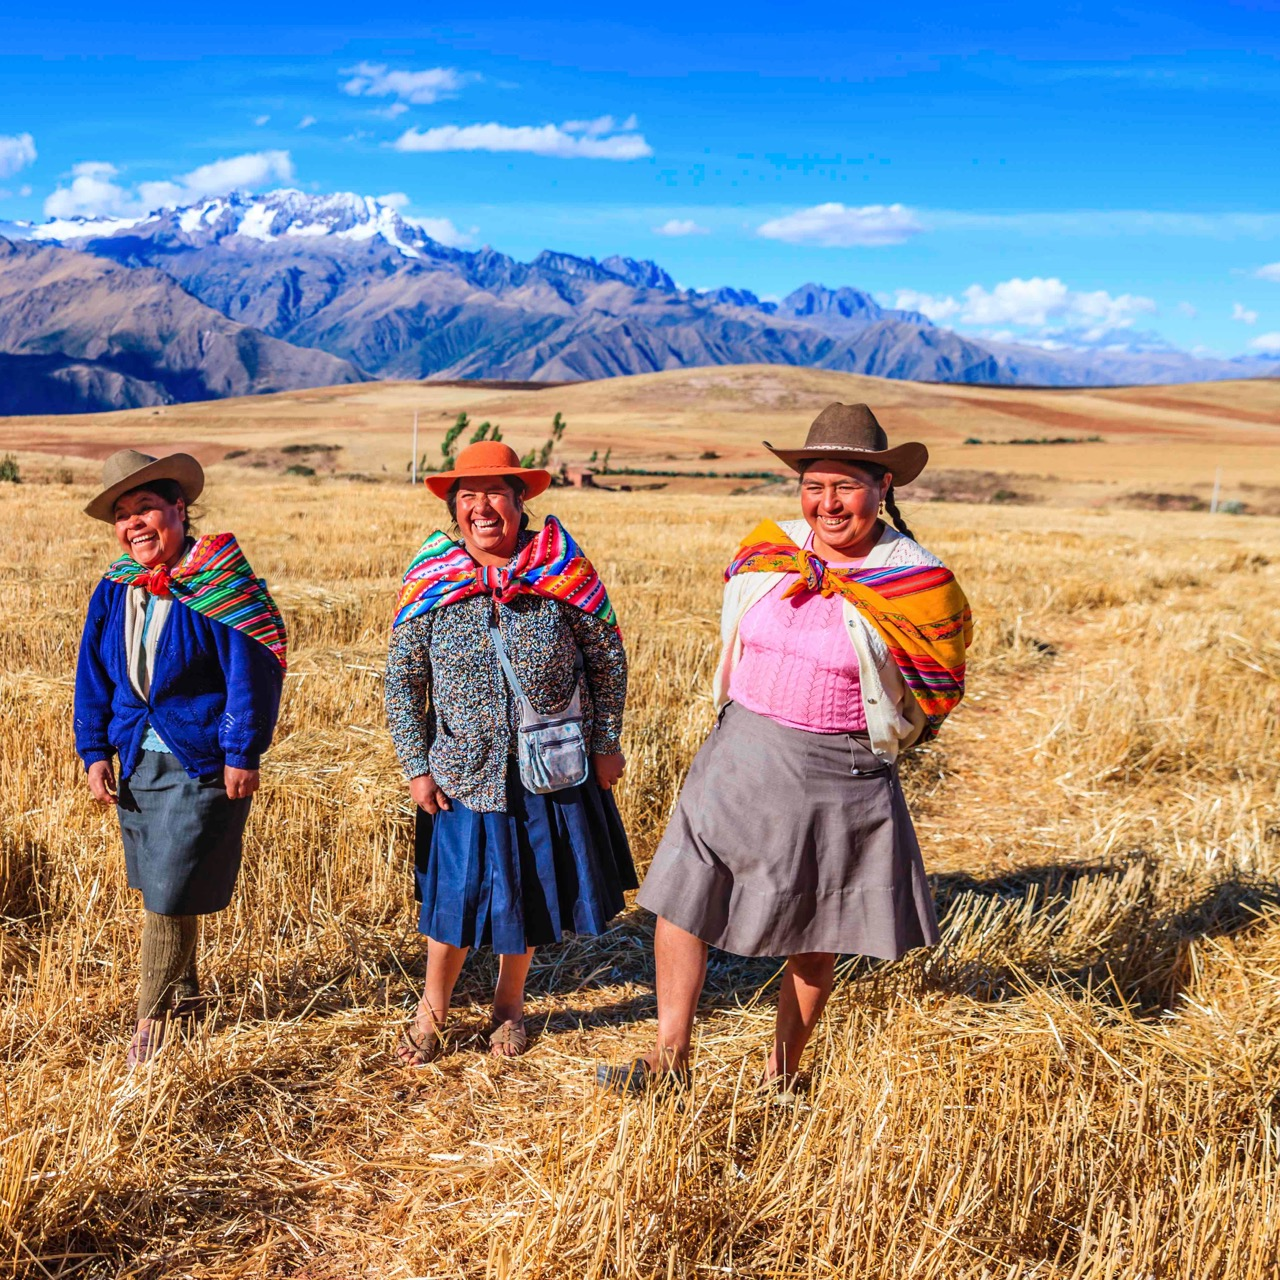 Peru group tour for singles | 101 Singles Holidays